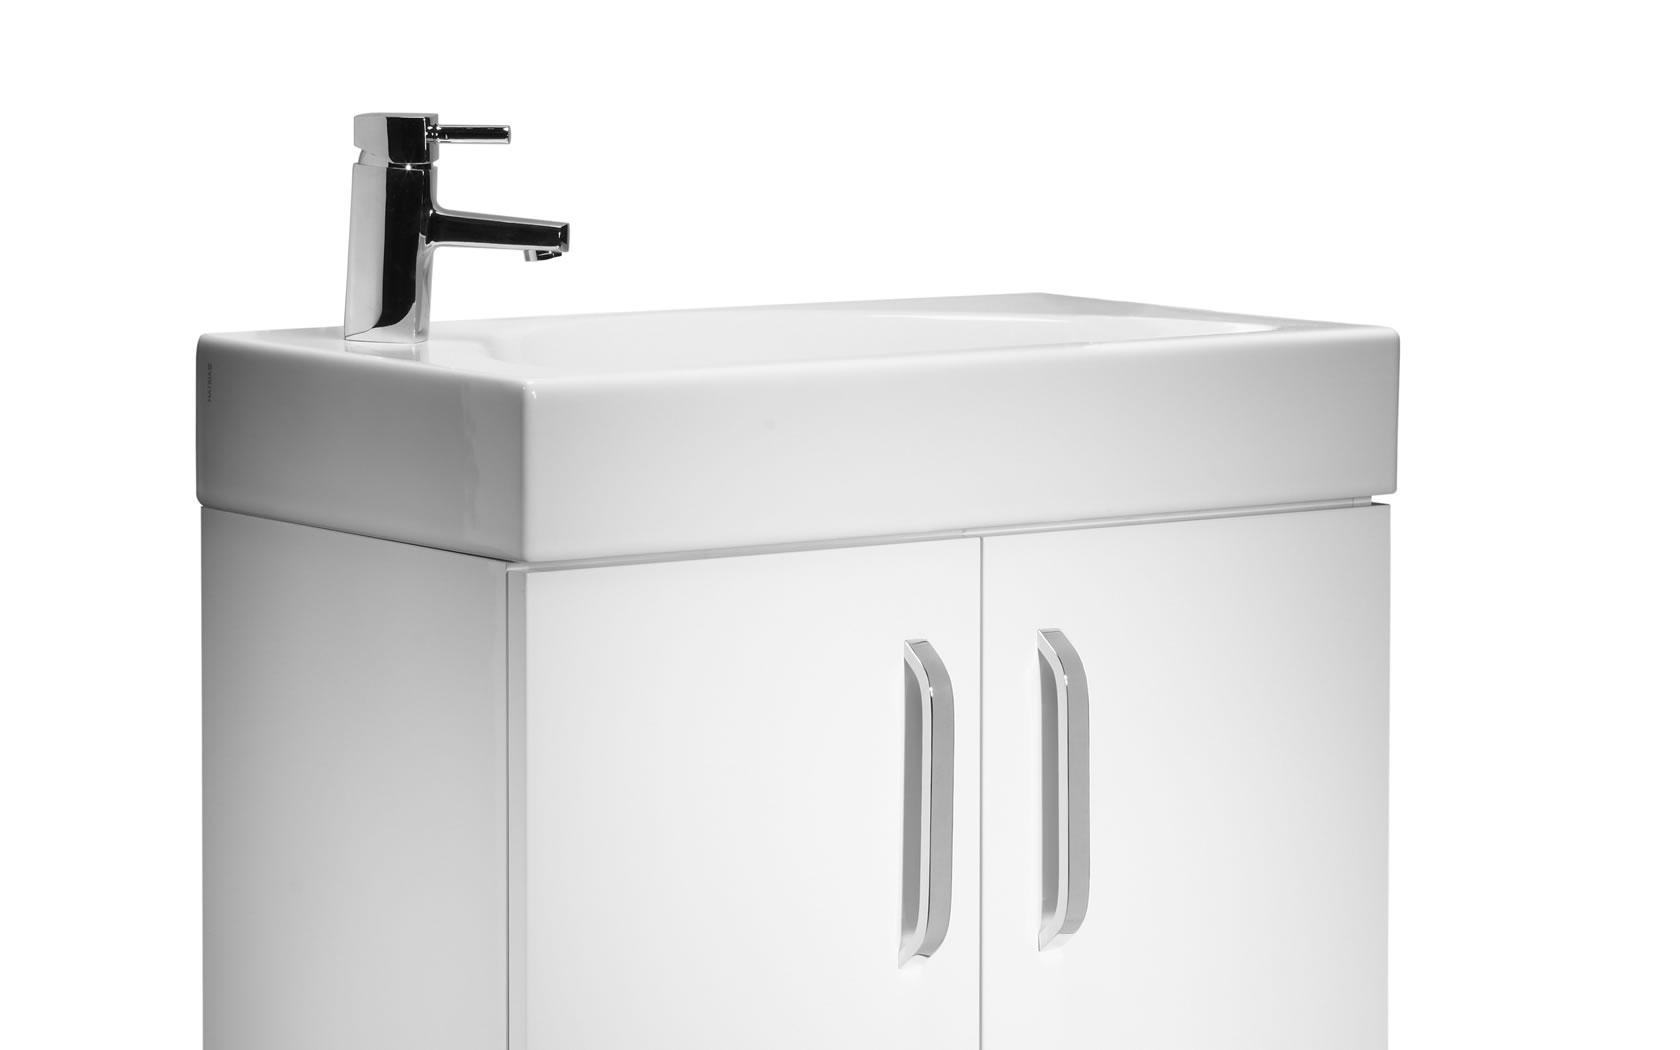 Model Bathroomfurnitureproductsgloucester1